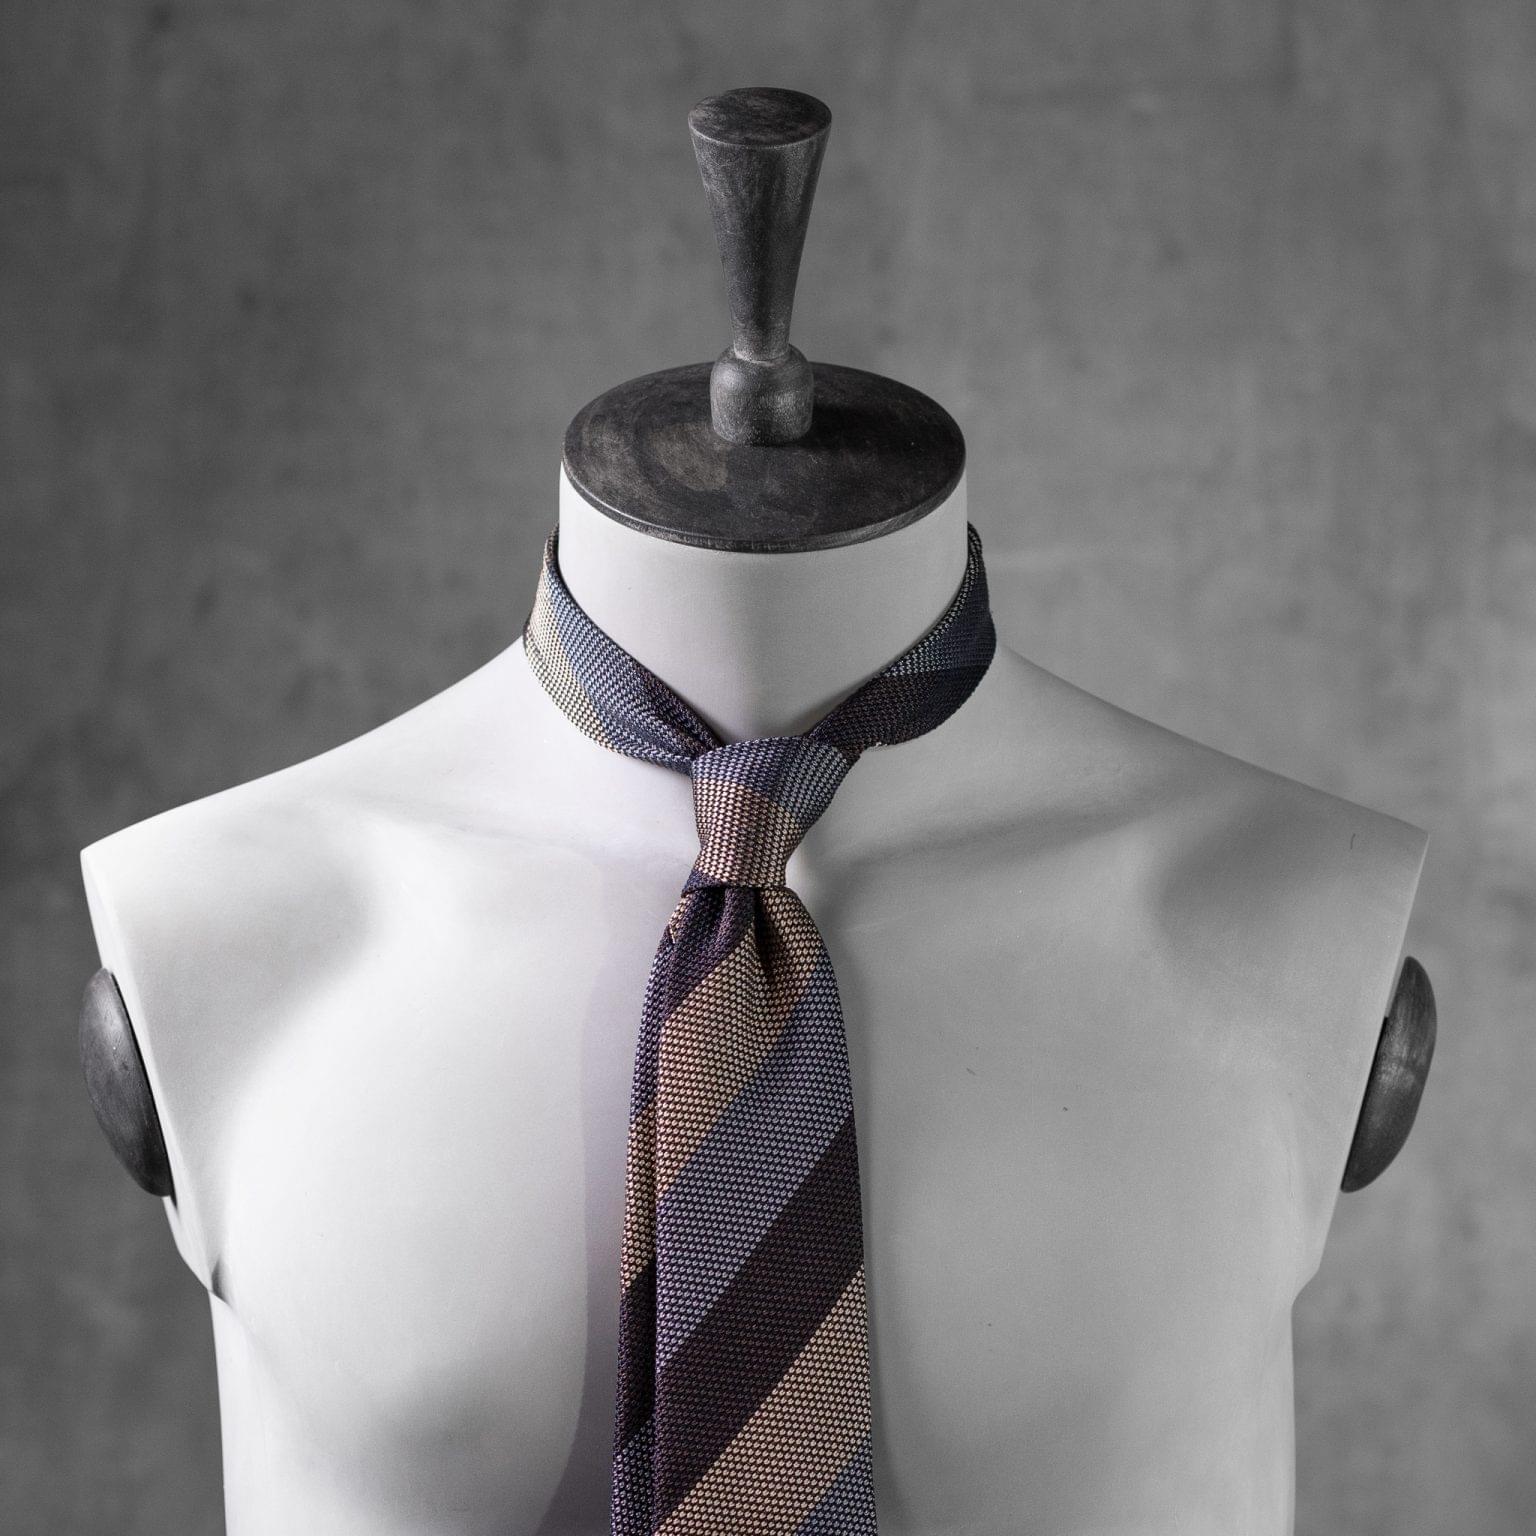 GRENADINE-0532-Tie-Initials-Corbata-Iniciales-The-Seelk-3